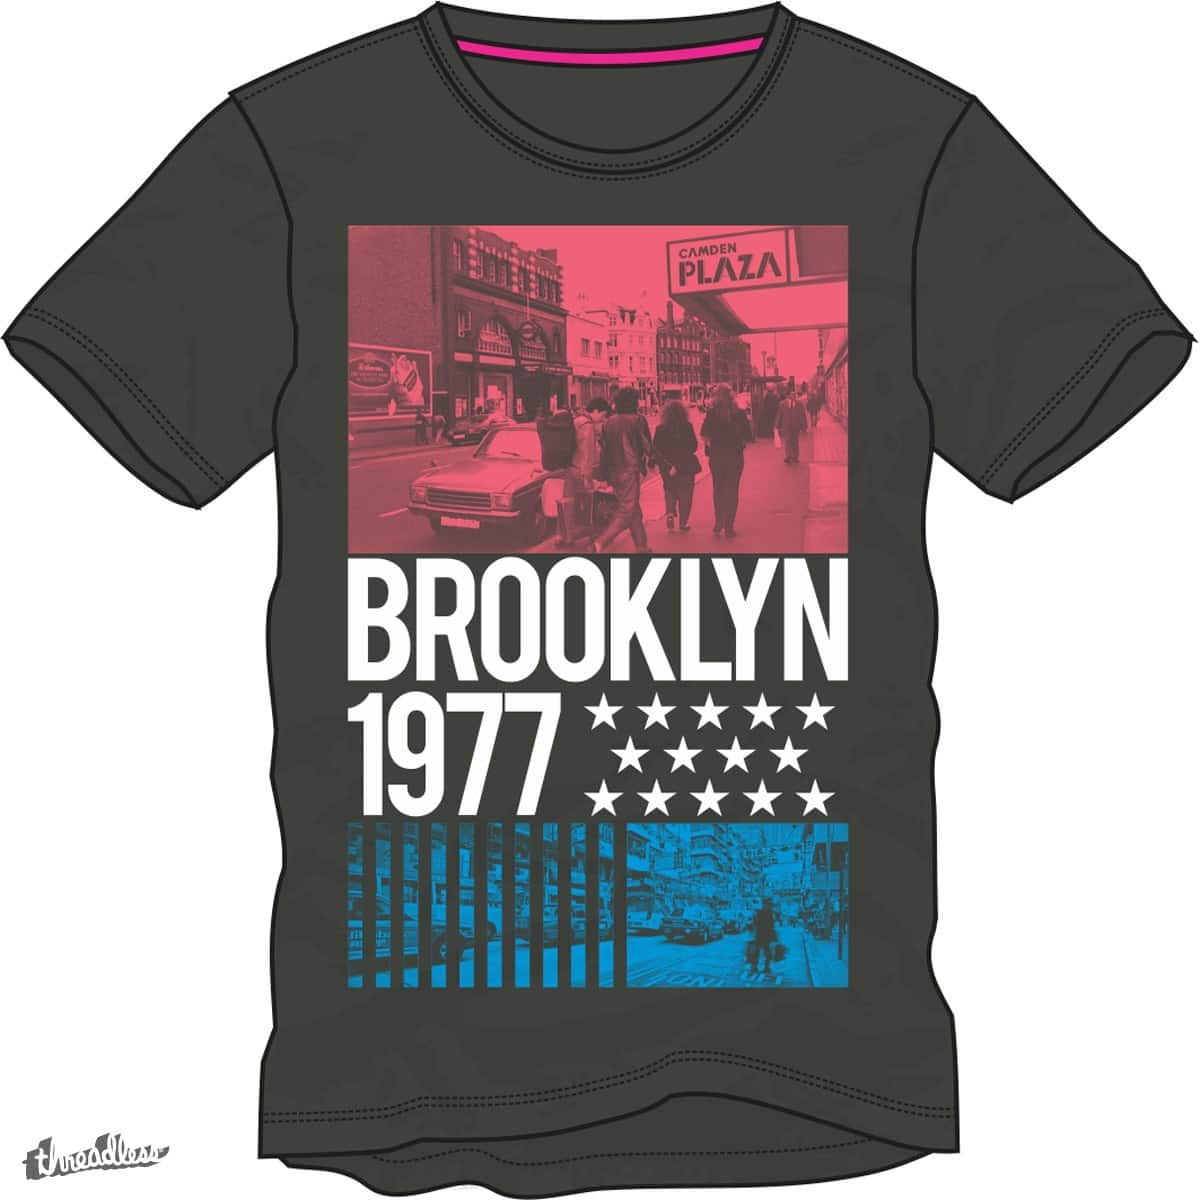 Score urban t-shirt by Javier Martin Gomez Lizarbe on Threadless